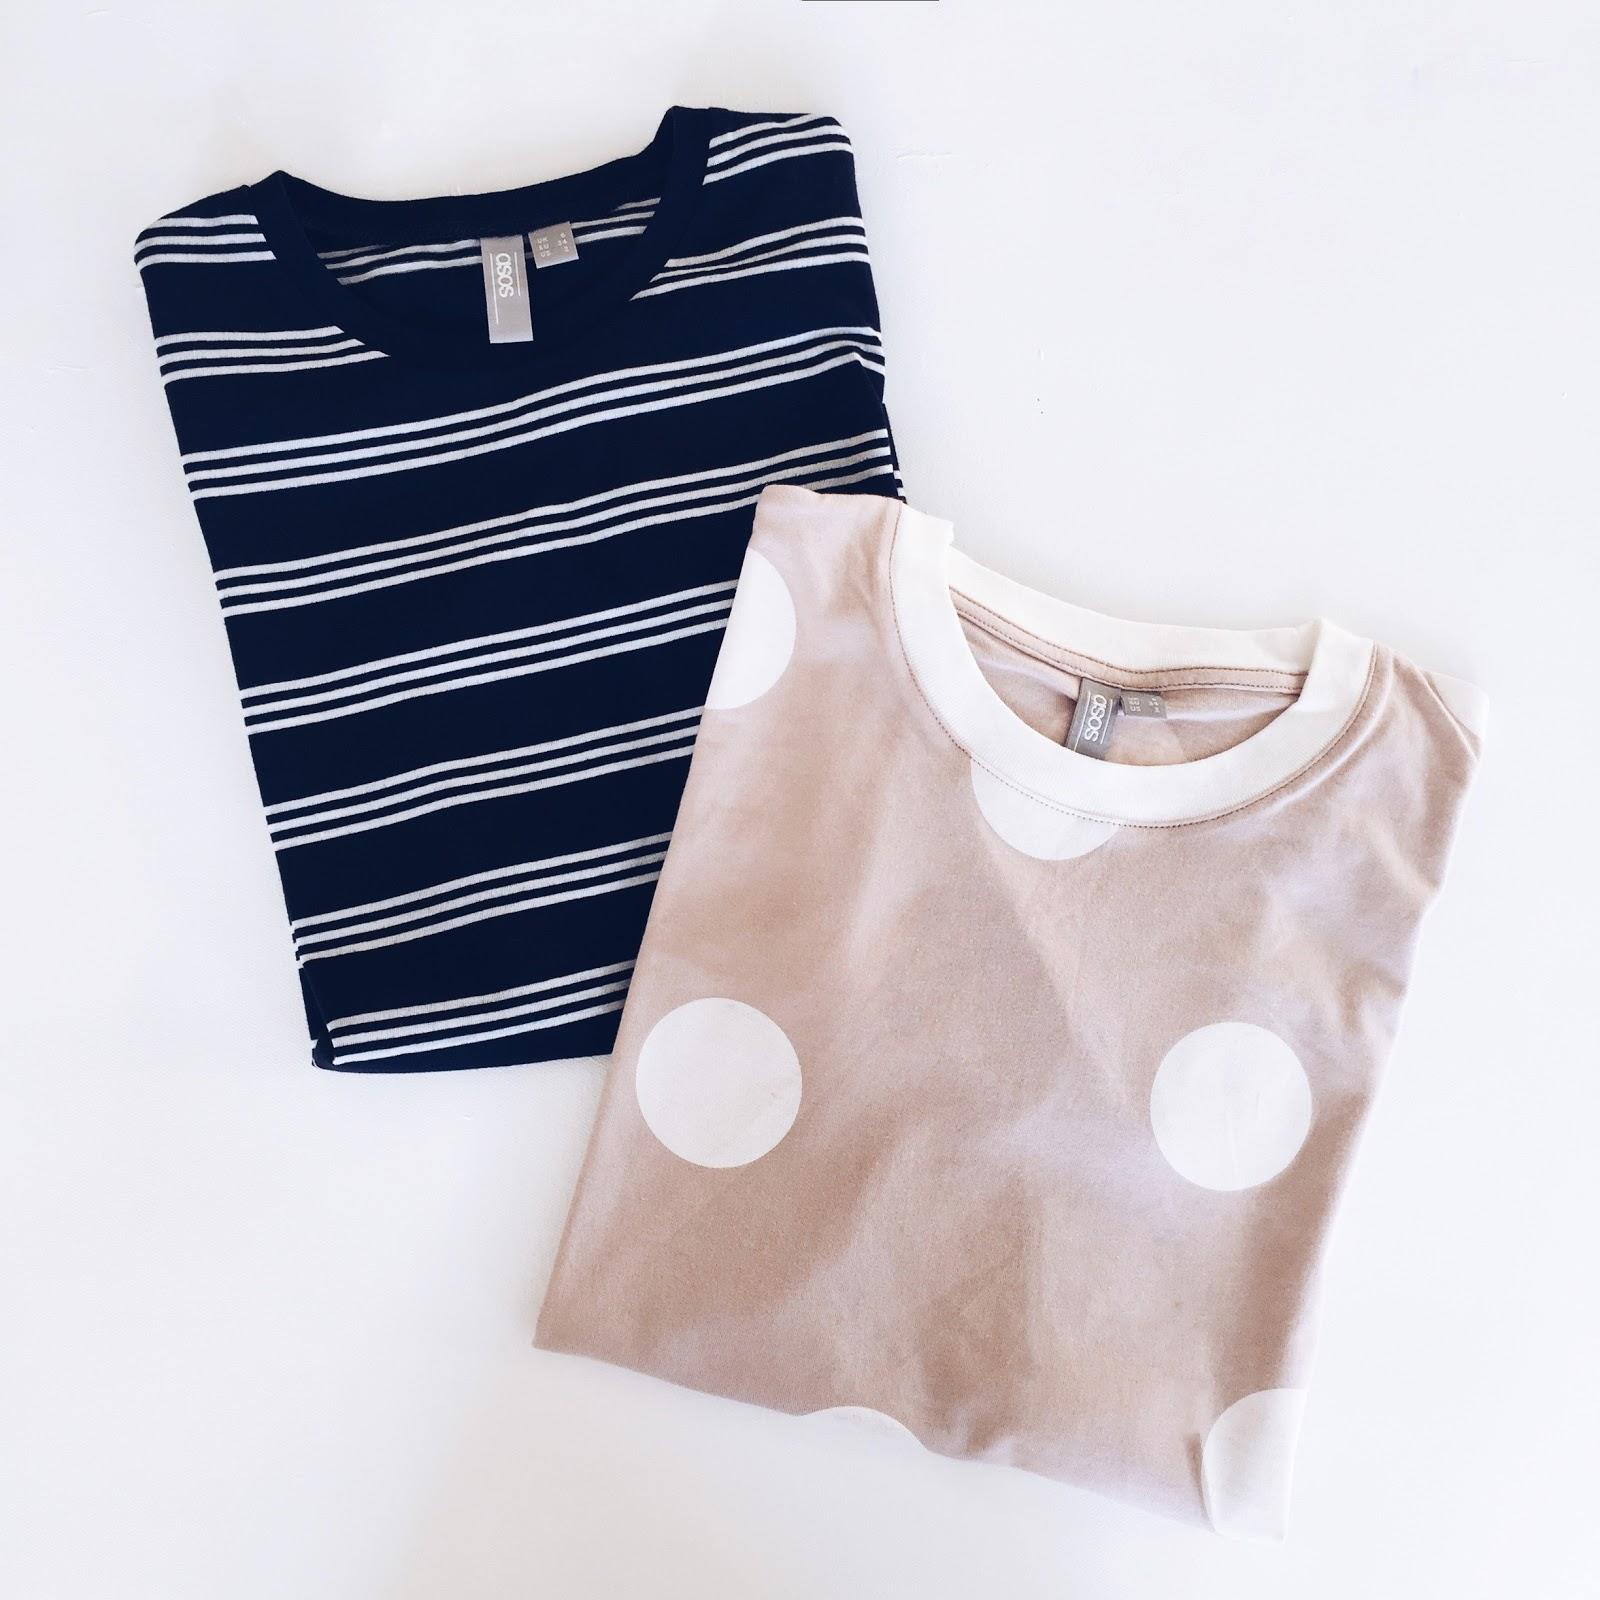 t-shirts from ASOS, Stripy t-shirt, spotty t-shirt